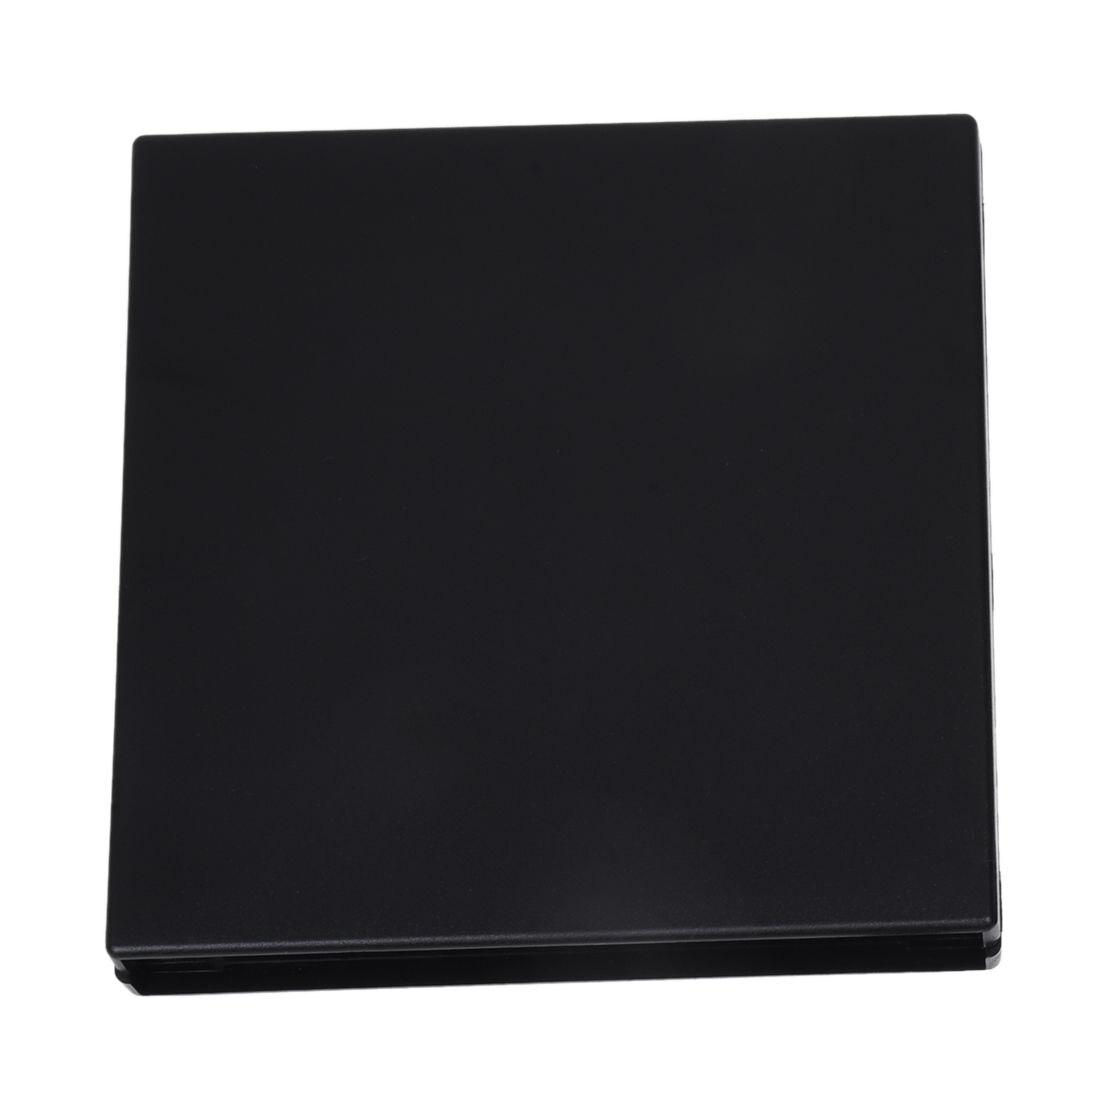 Laptop USB para Sata CD DVD RW Drive Caixa Externa Caddy